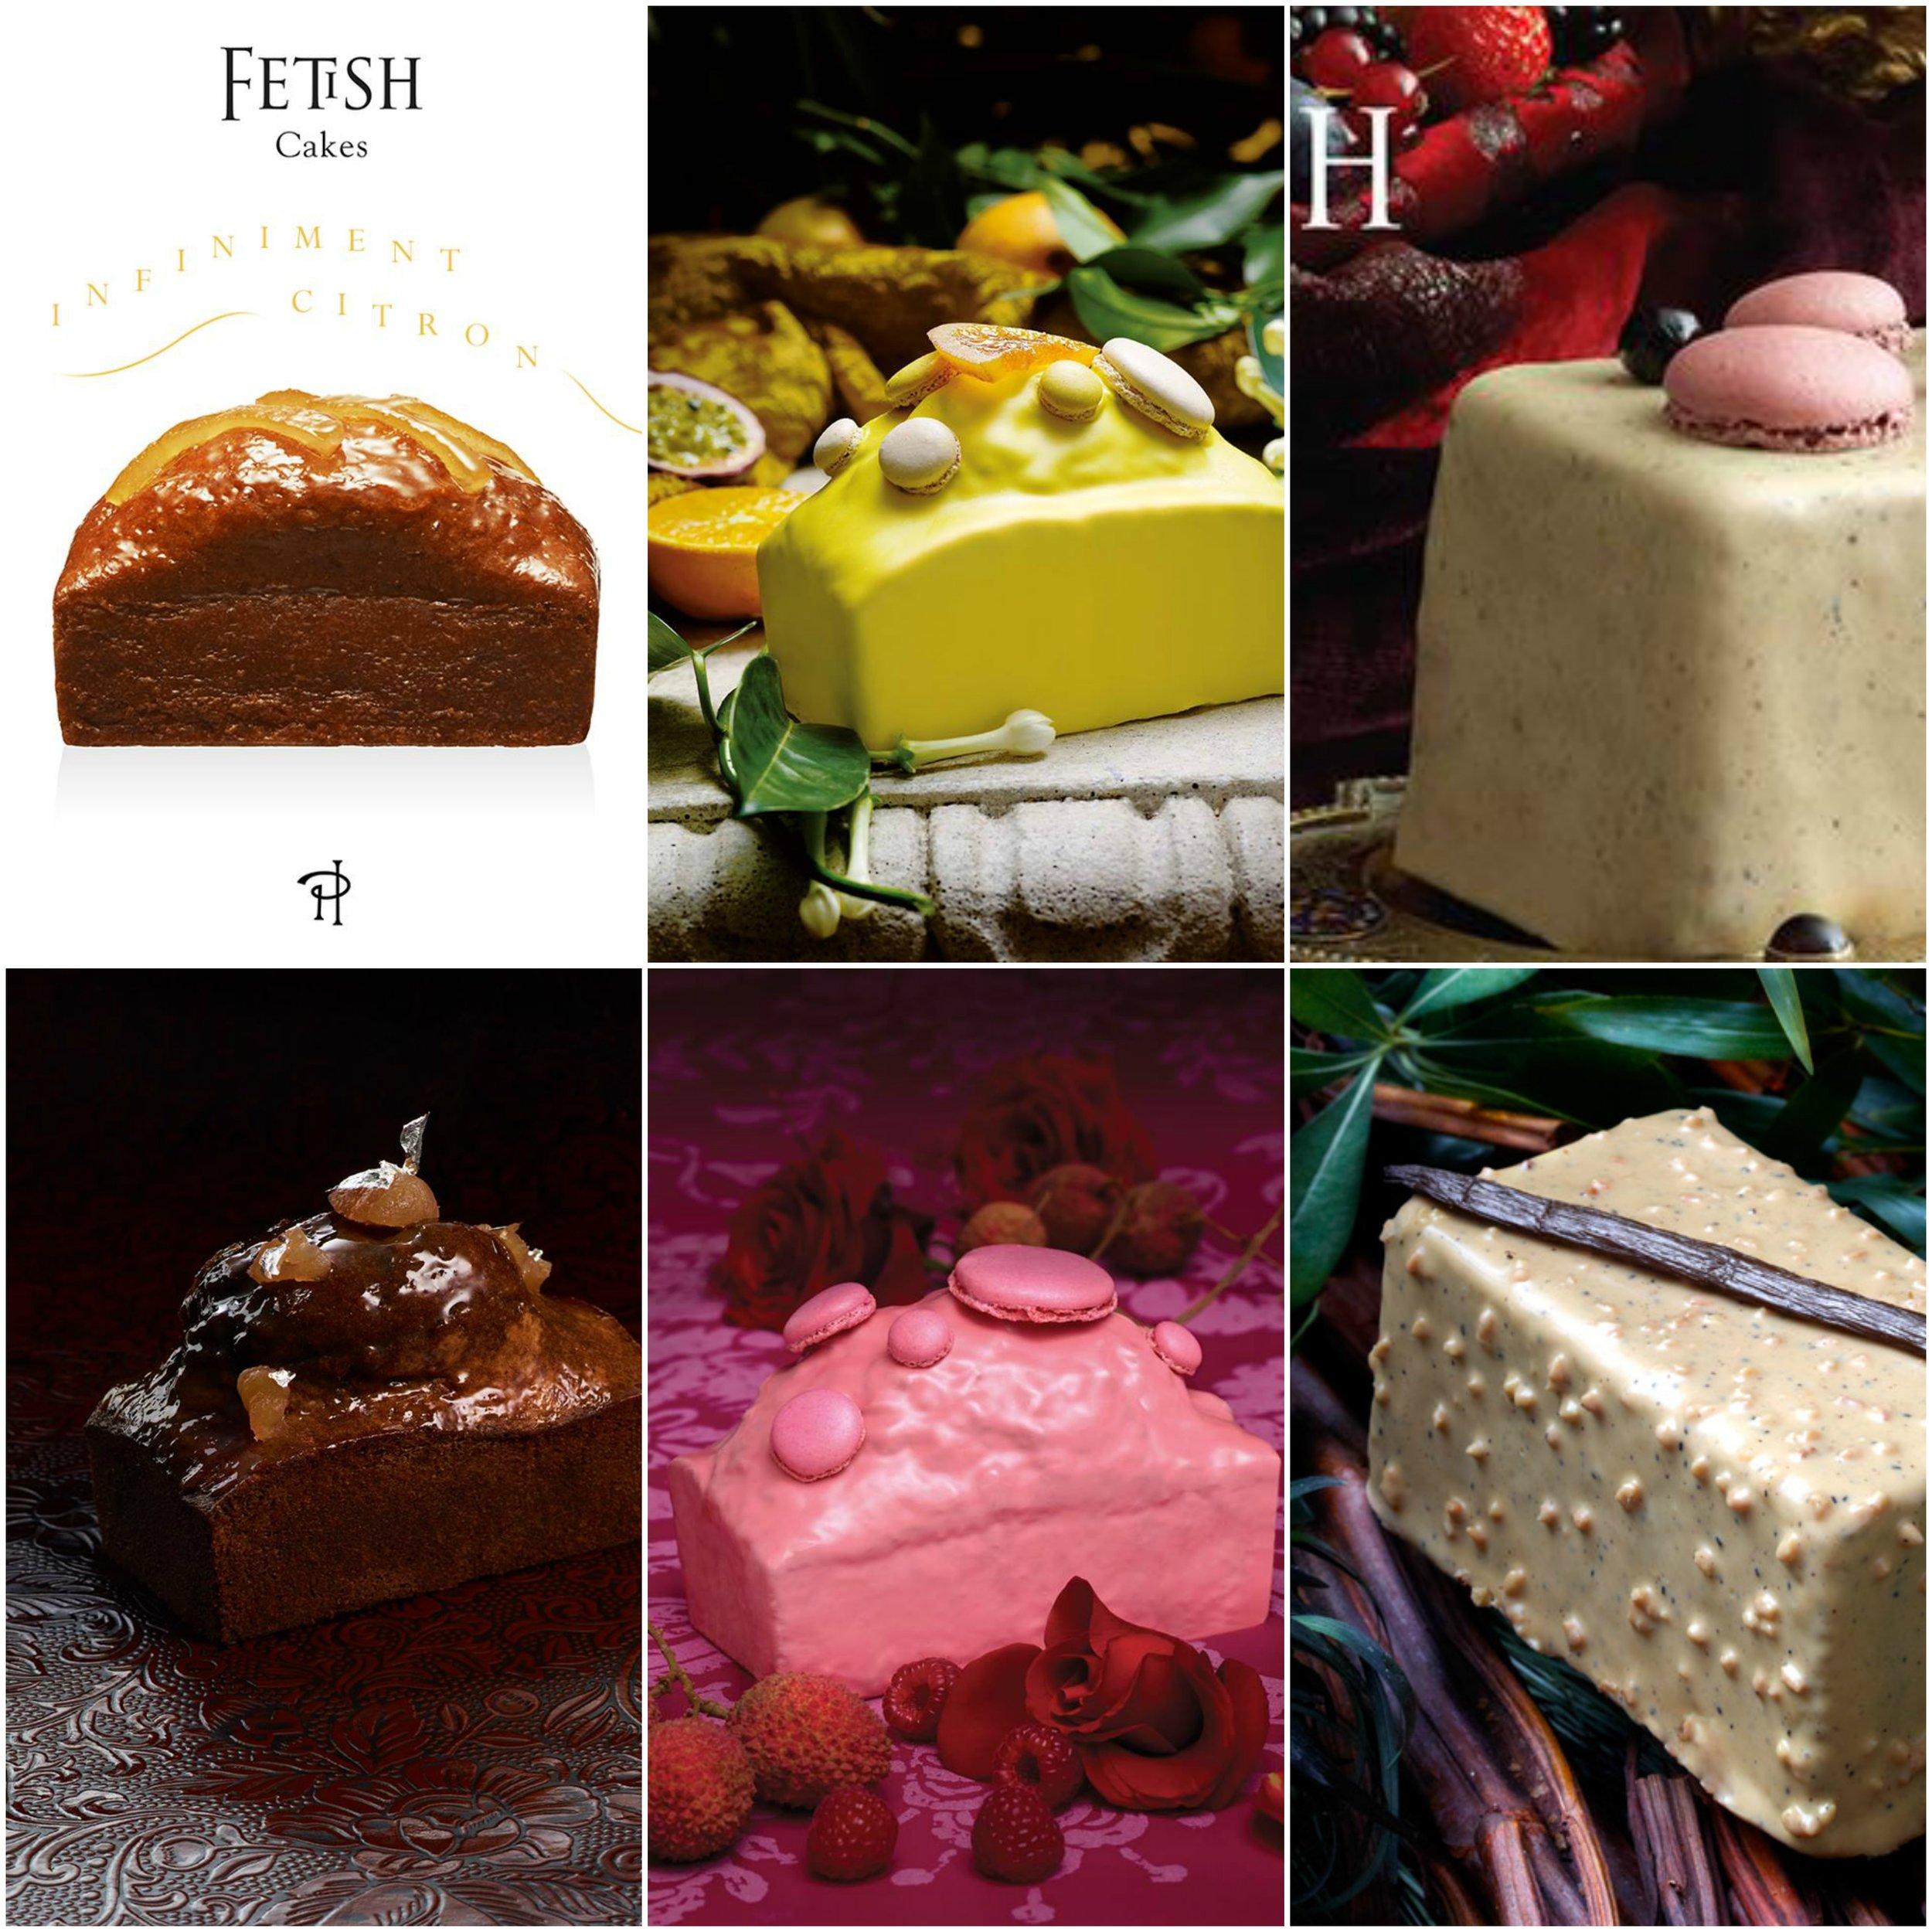 Pierre Hermé  的各種磅蛋糕。不是以淋醬完全包裹、就是在頂端也刷上鏡面果膠。 Photo|Facebook,  Pierre Hermé Paris